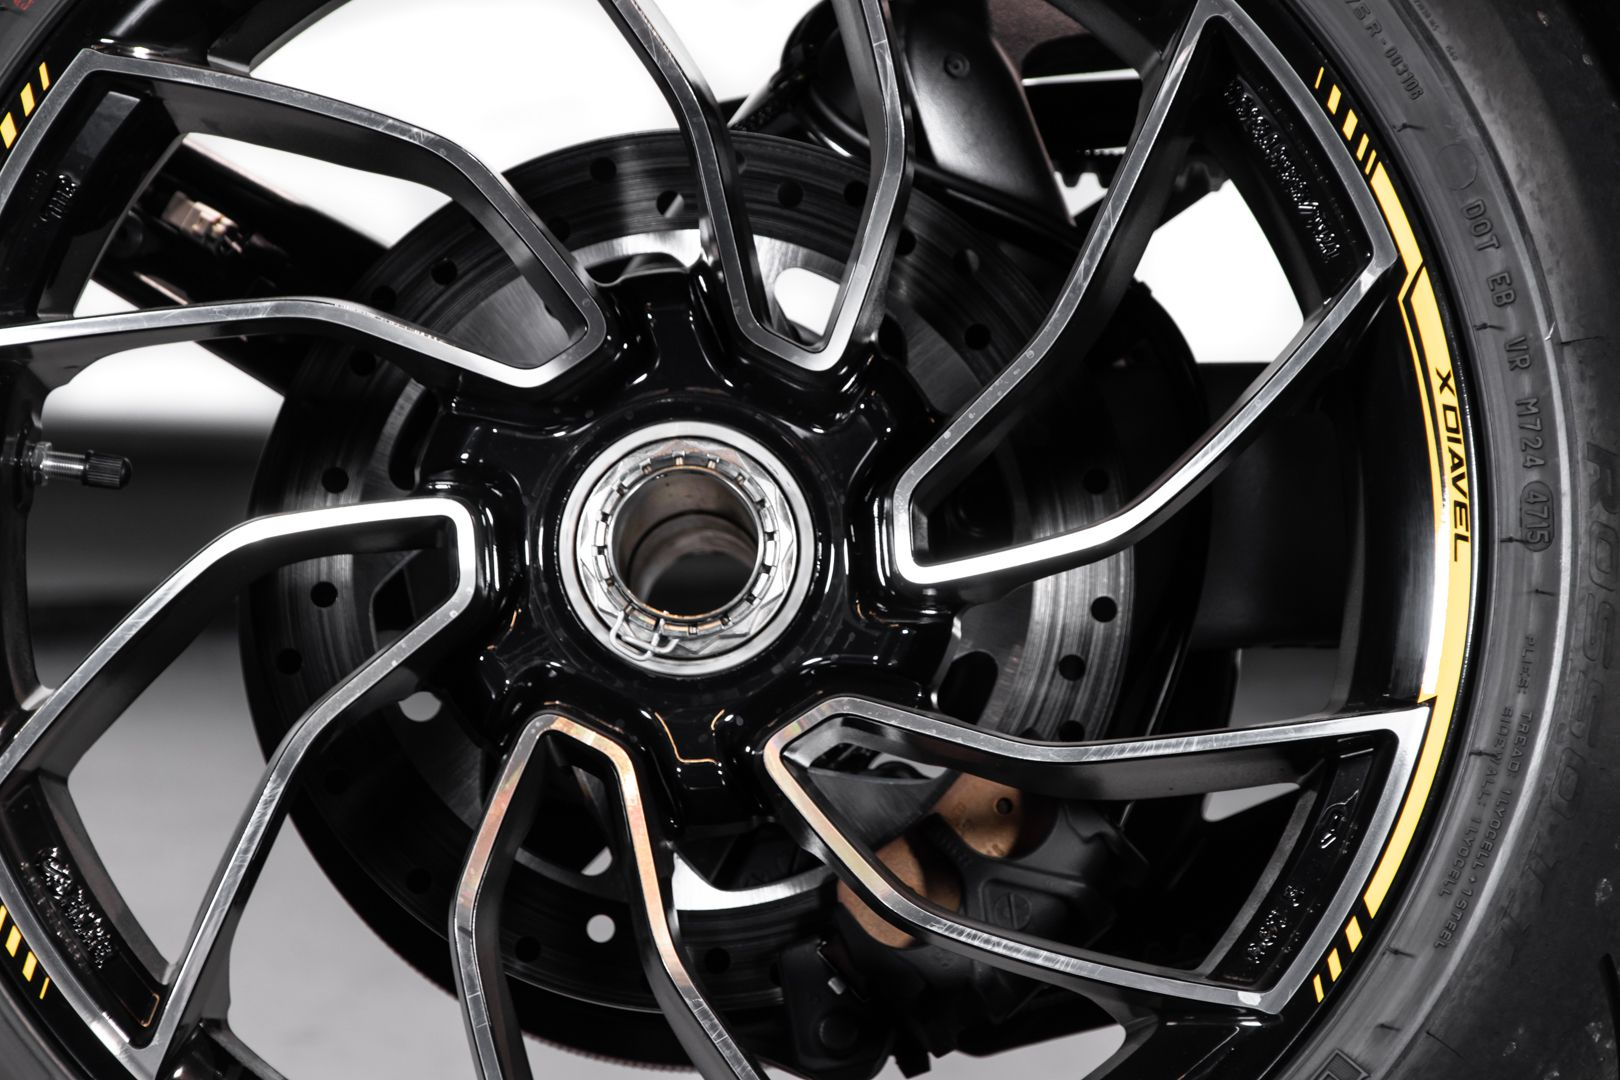 2016 Ducati X Diavel S 72377